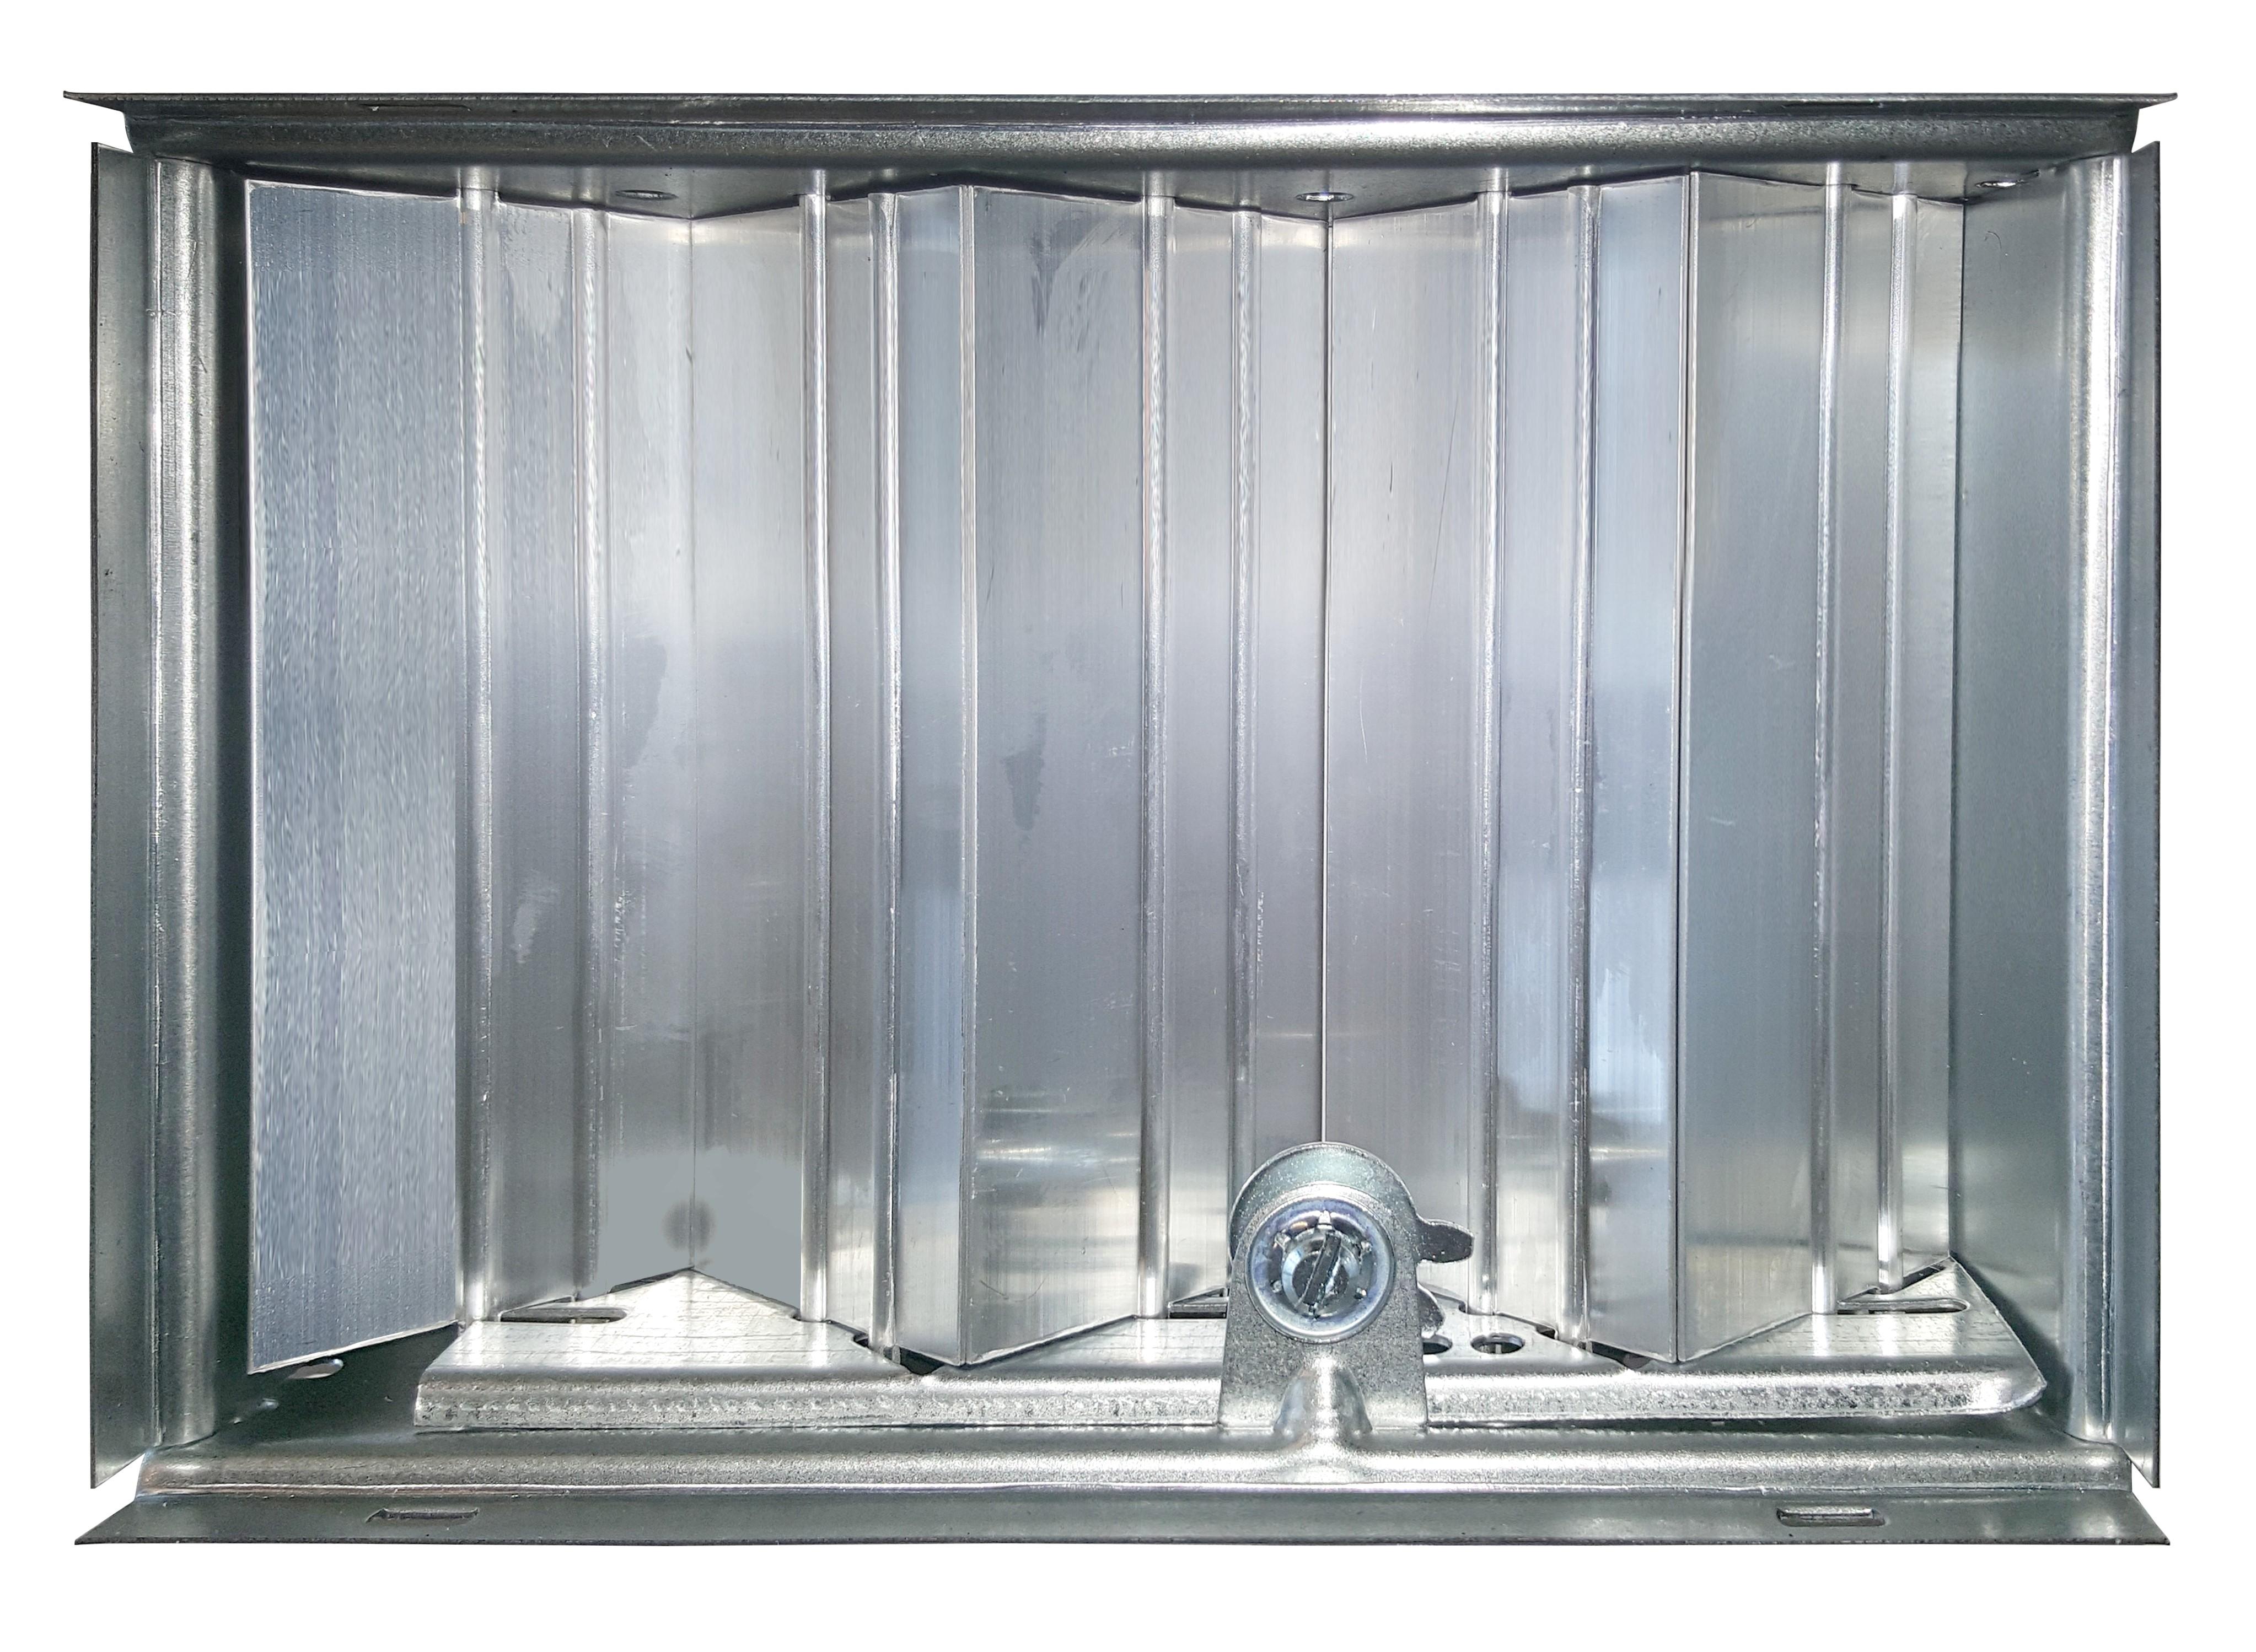 Serranda di regolazione a contrasto per bocchette dimensione 1000x200 mm serie BBMA/BGRA